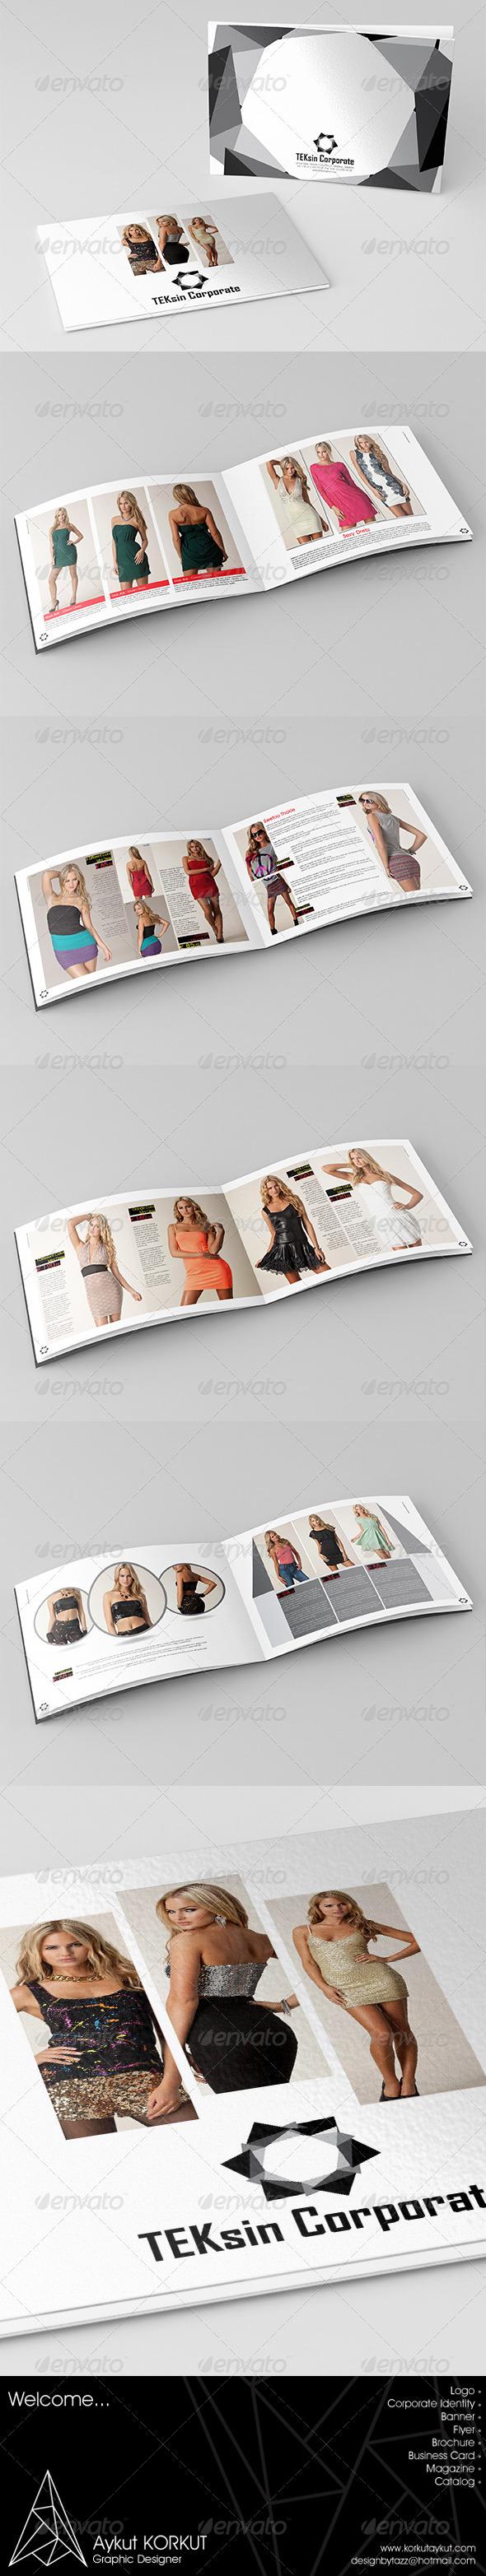 GraphicRiver Teksin Corporate Catalog Template 5860872